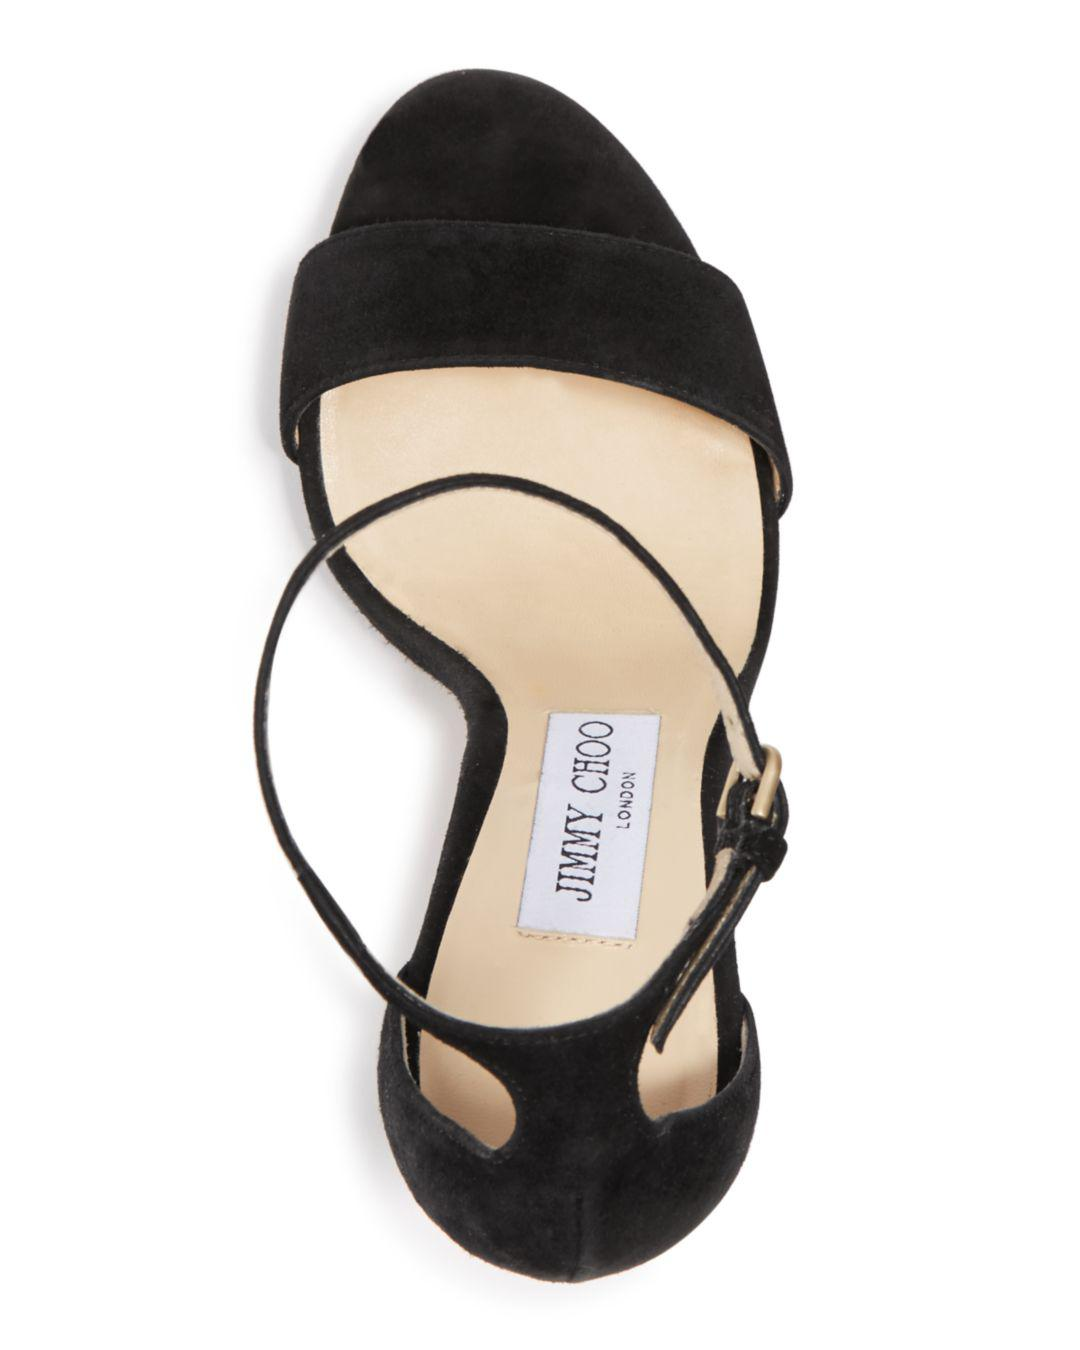 3f05389b969 Jimmy Choo - Multicolor Women s Misty 120 Suede High-heel Platform Sandals  - Lyst. View fullscreen